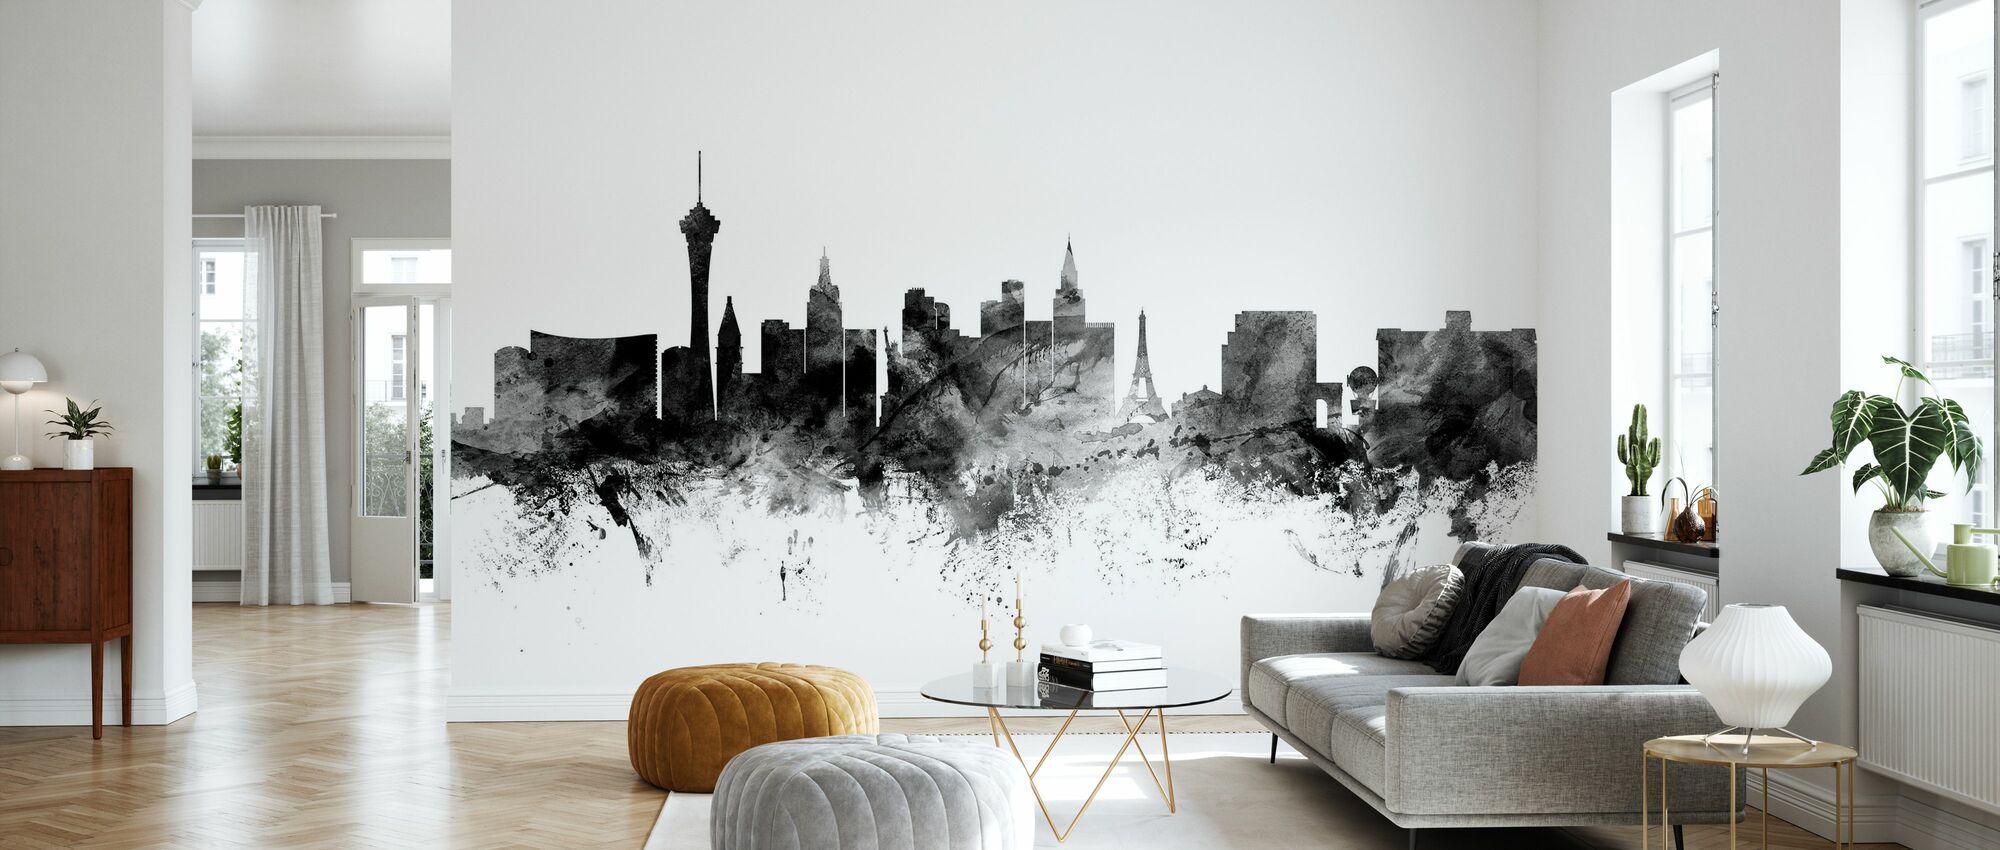 Las Vegas Skyline Black - Wallpaper - Living Room